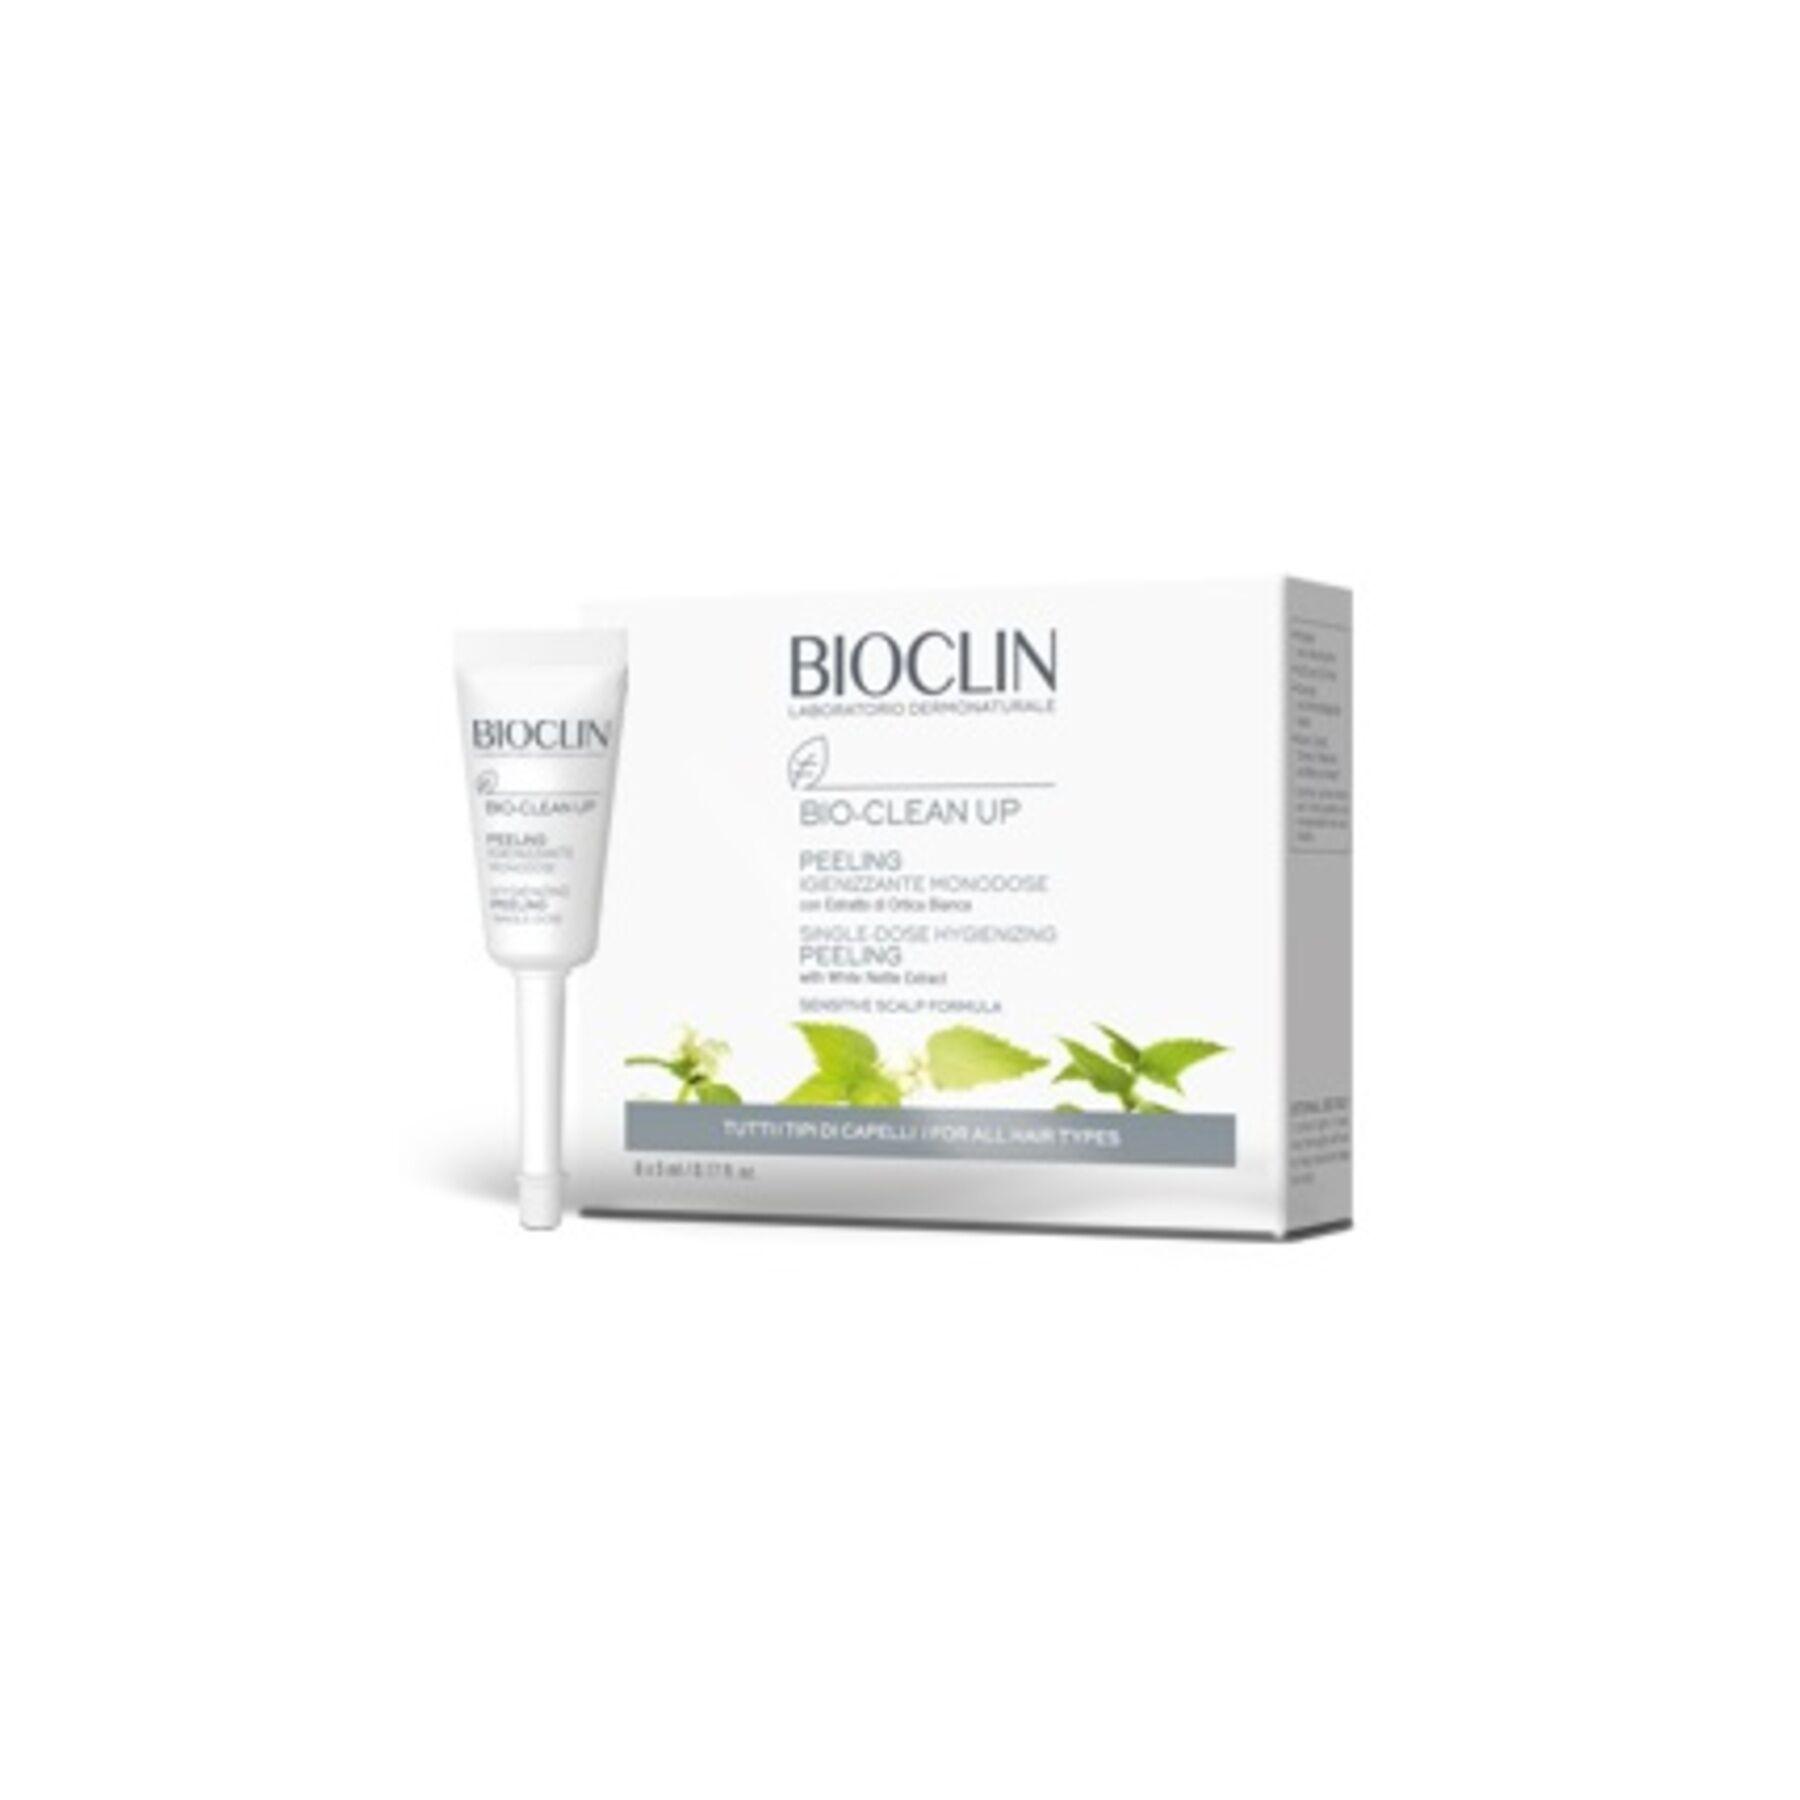 IST.GANASSINI SpA Bioclin bio clean up trattamento peeling modose